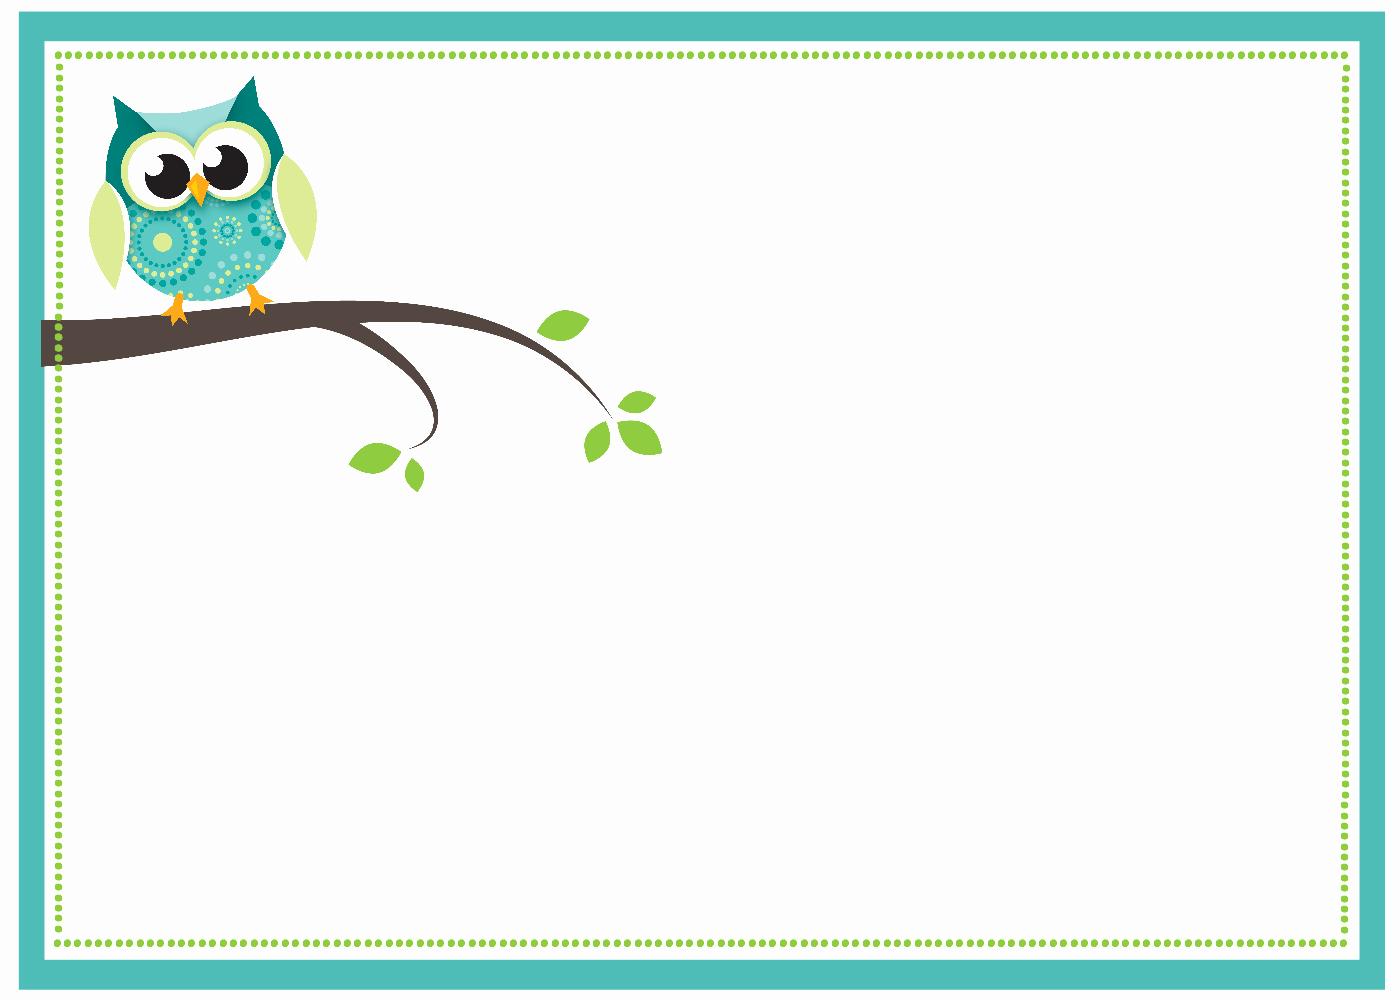 Baby Shower Invitation Free Printable Beautiful Free Printable Owl Baby Shower Invitations & Other